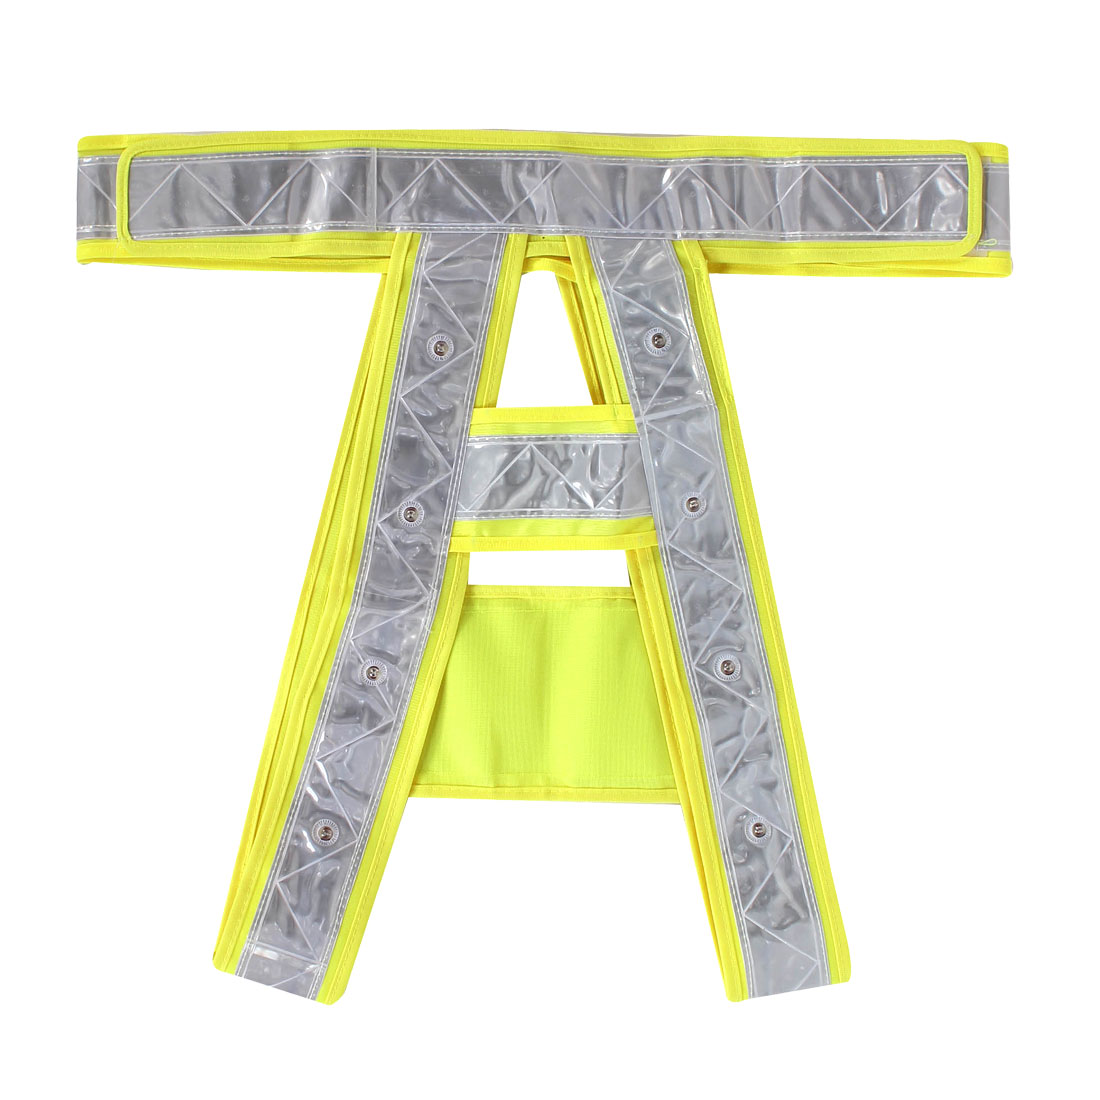 Cyclists Runner Detachable Straps 16 LED Light Up Reflective Stripes Safety Vest